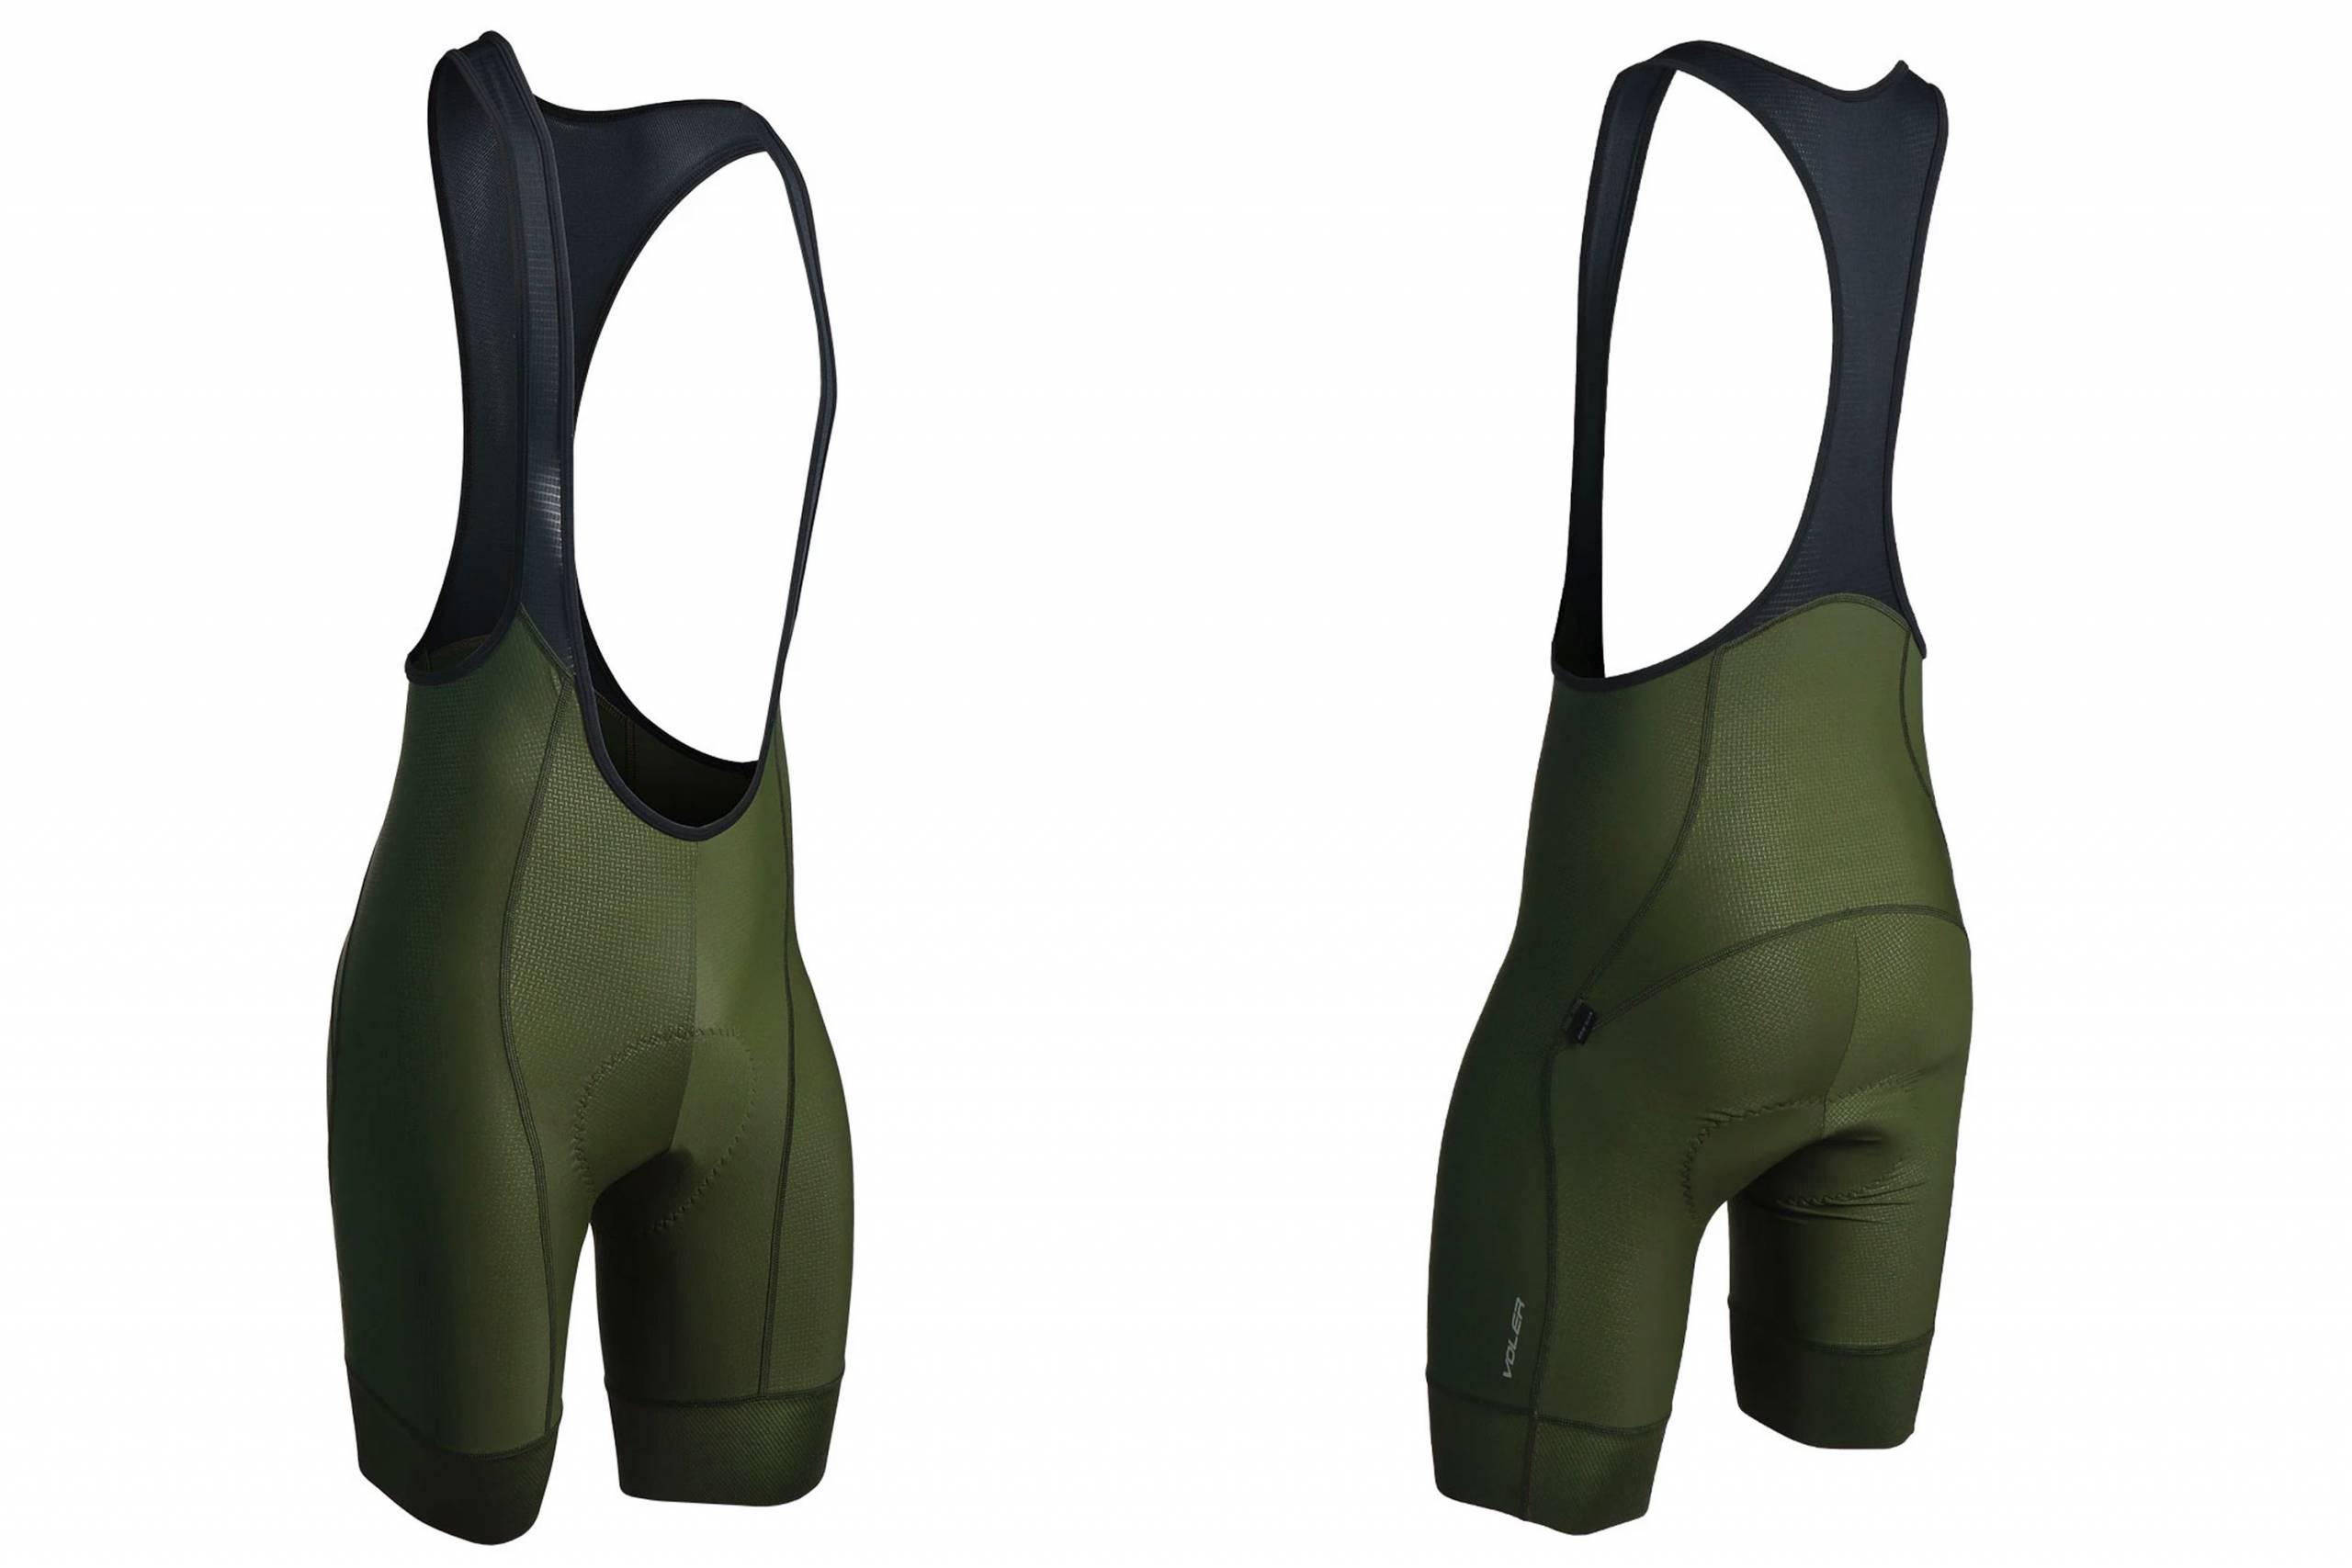 GearJunkie_Best_Bib_shorts_2021_Voler_Black_Label_Bibs